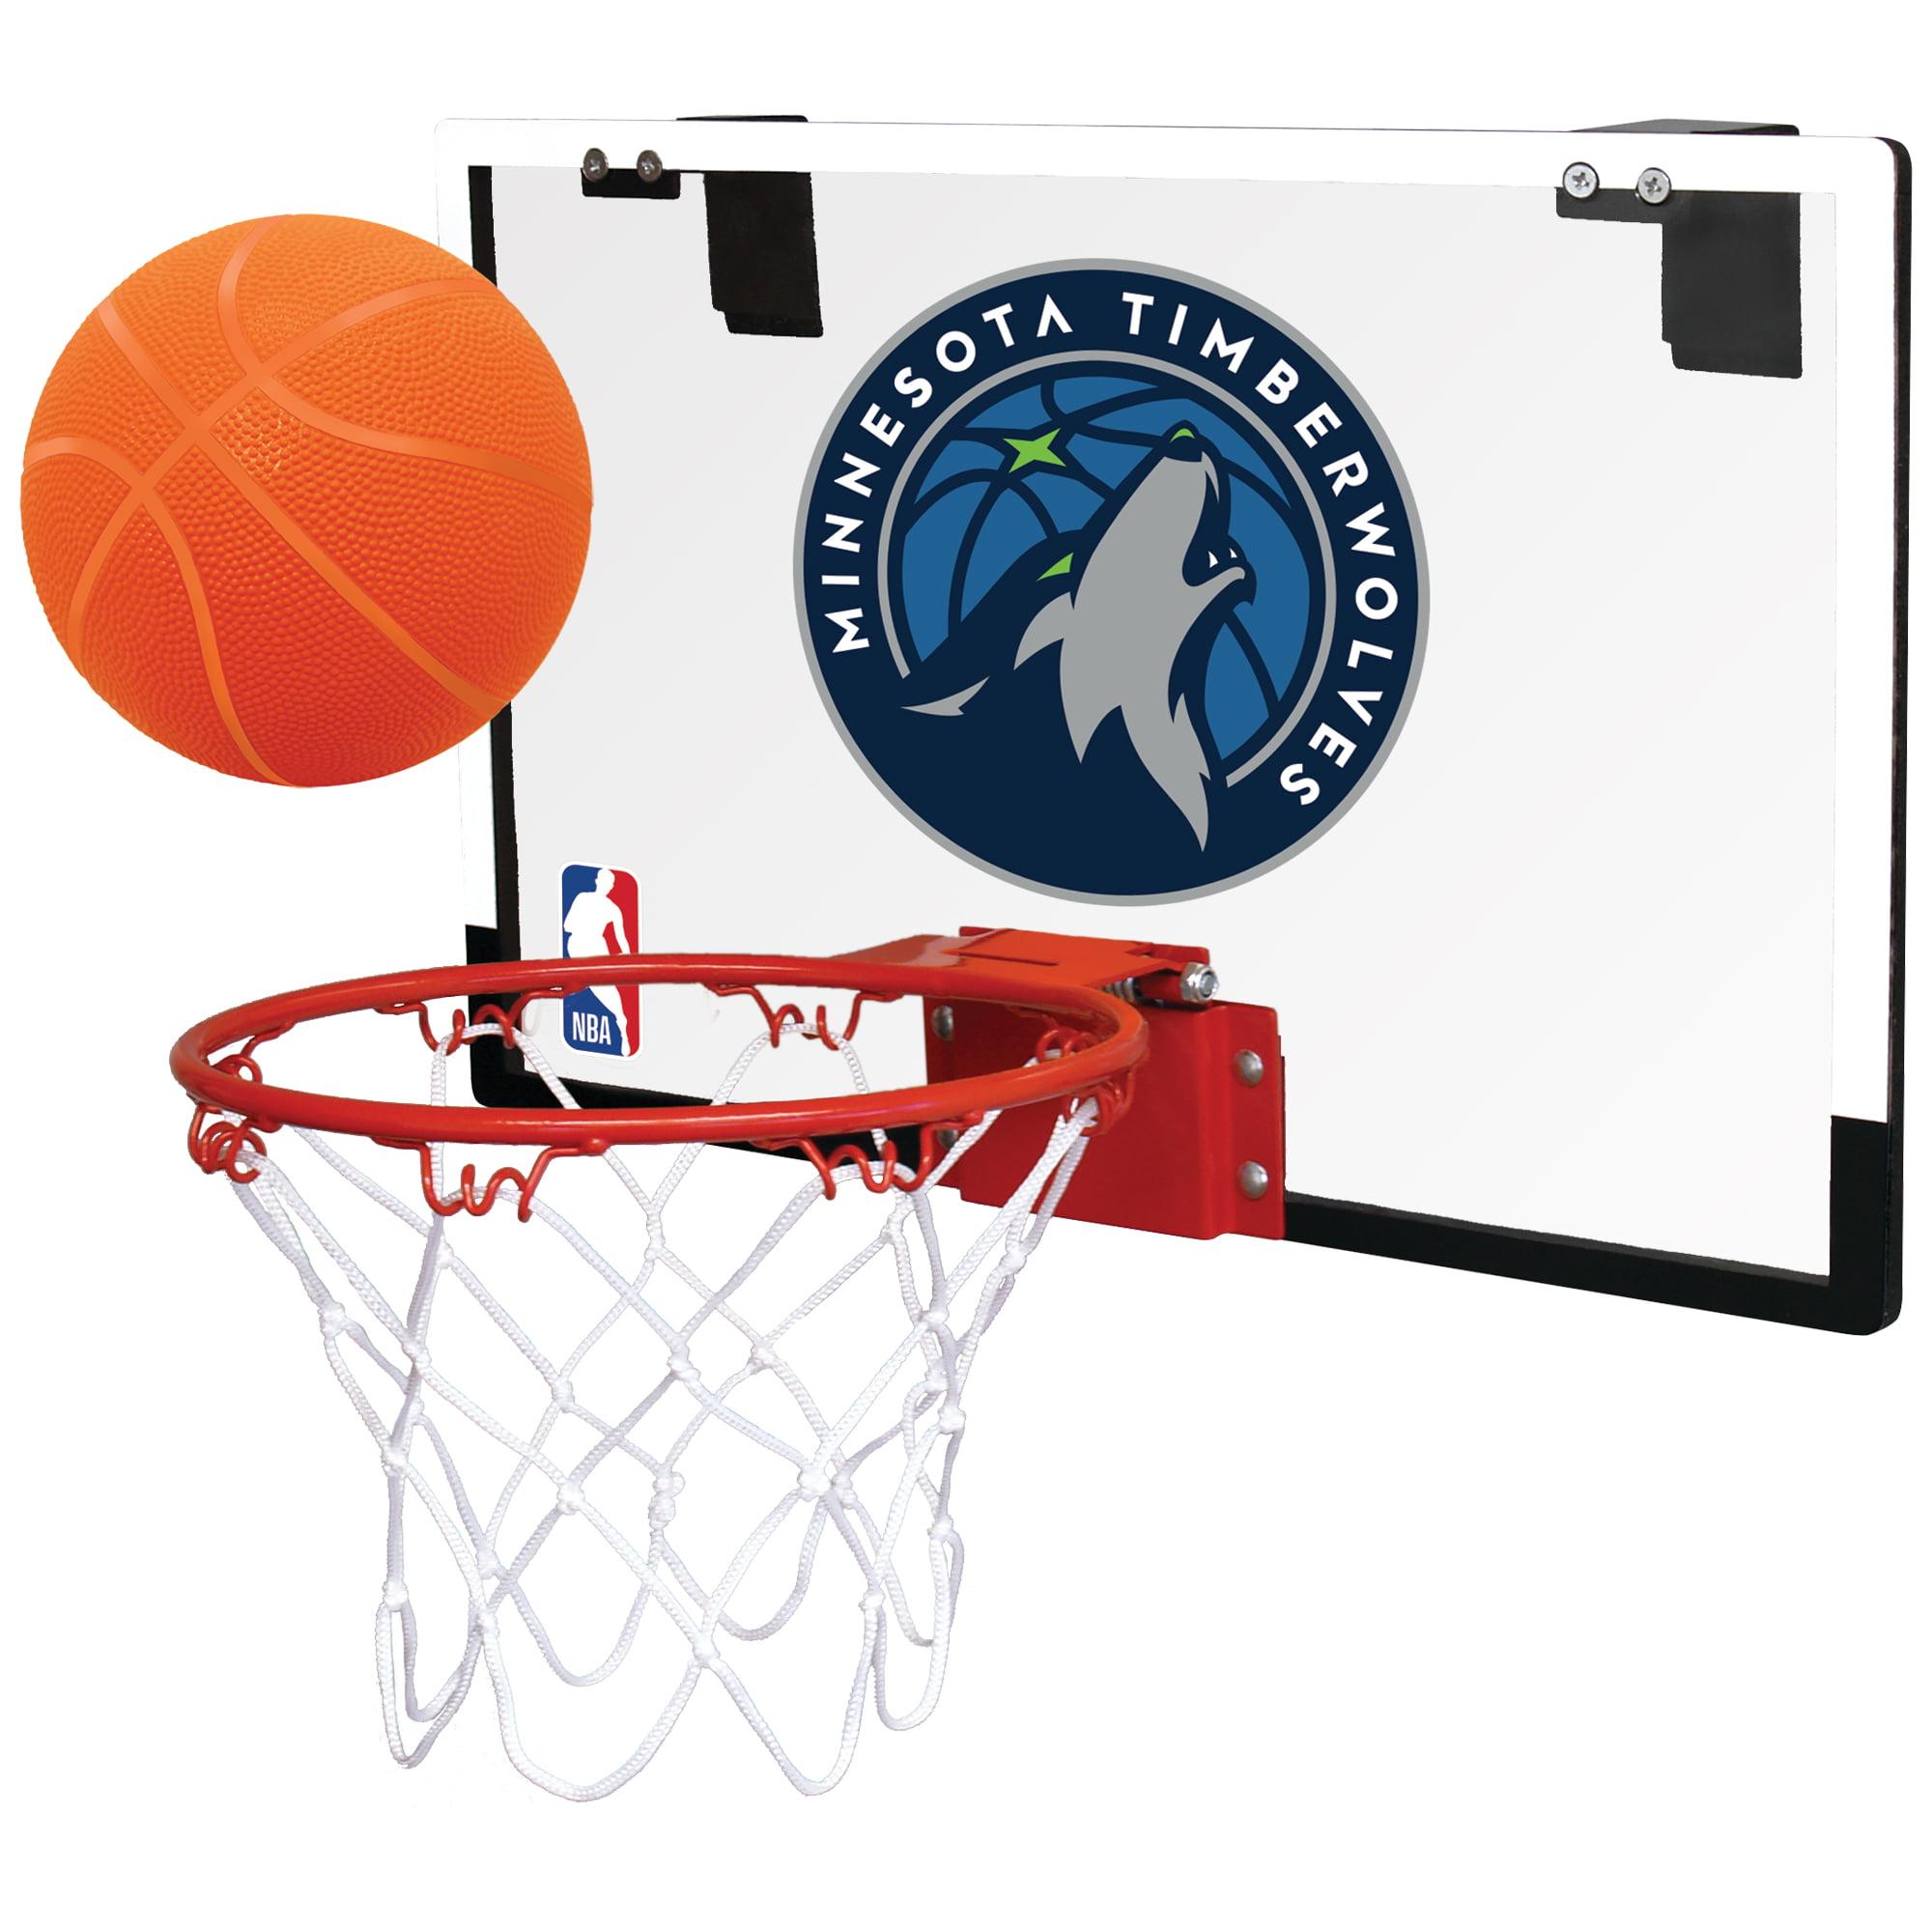 Rawlings NBA Game On Basketball Hoop Set, Minnesota Timberwolves by Rawlings